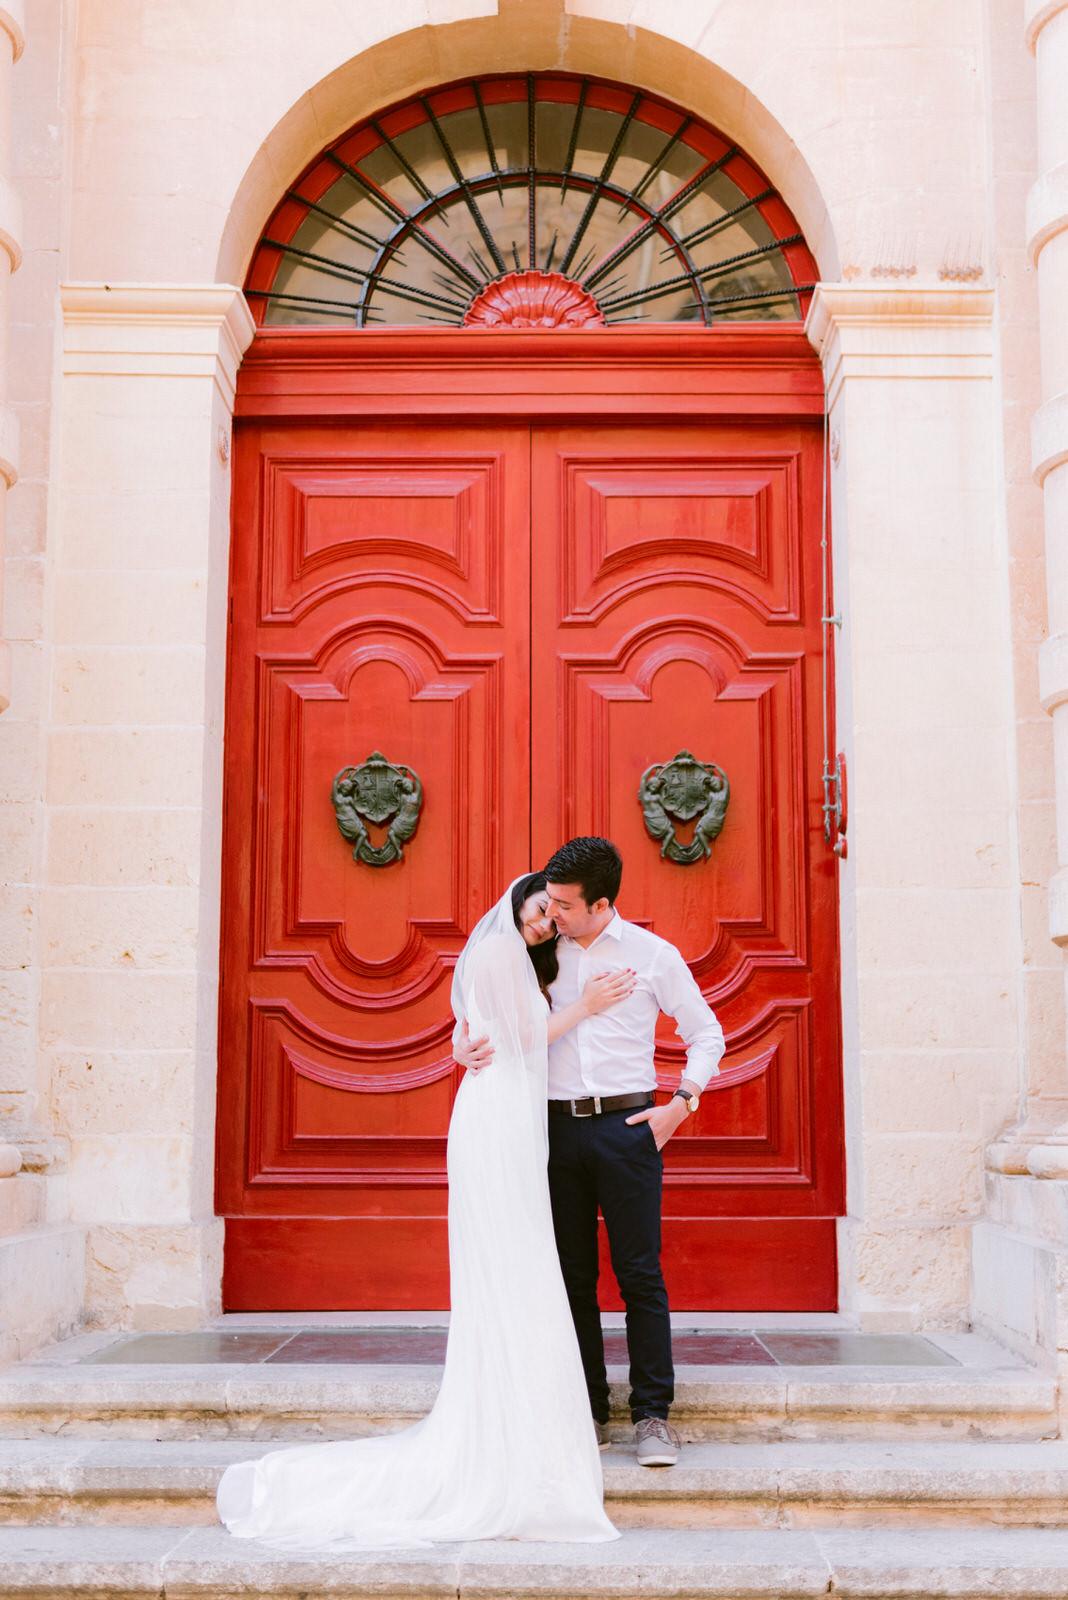 mdina wedding, malta wedding photography, malta elopement, golden bay malta wedding photos, wedding photographer malta, malta wedding venue, villa bologna wedding (20).jpg